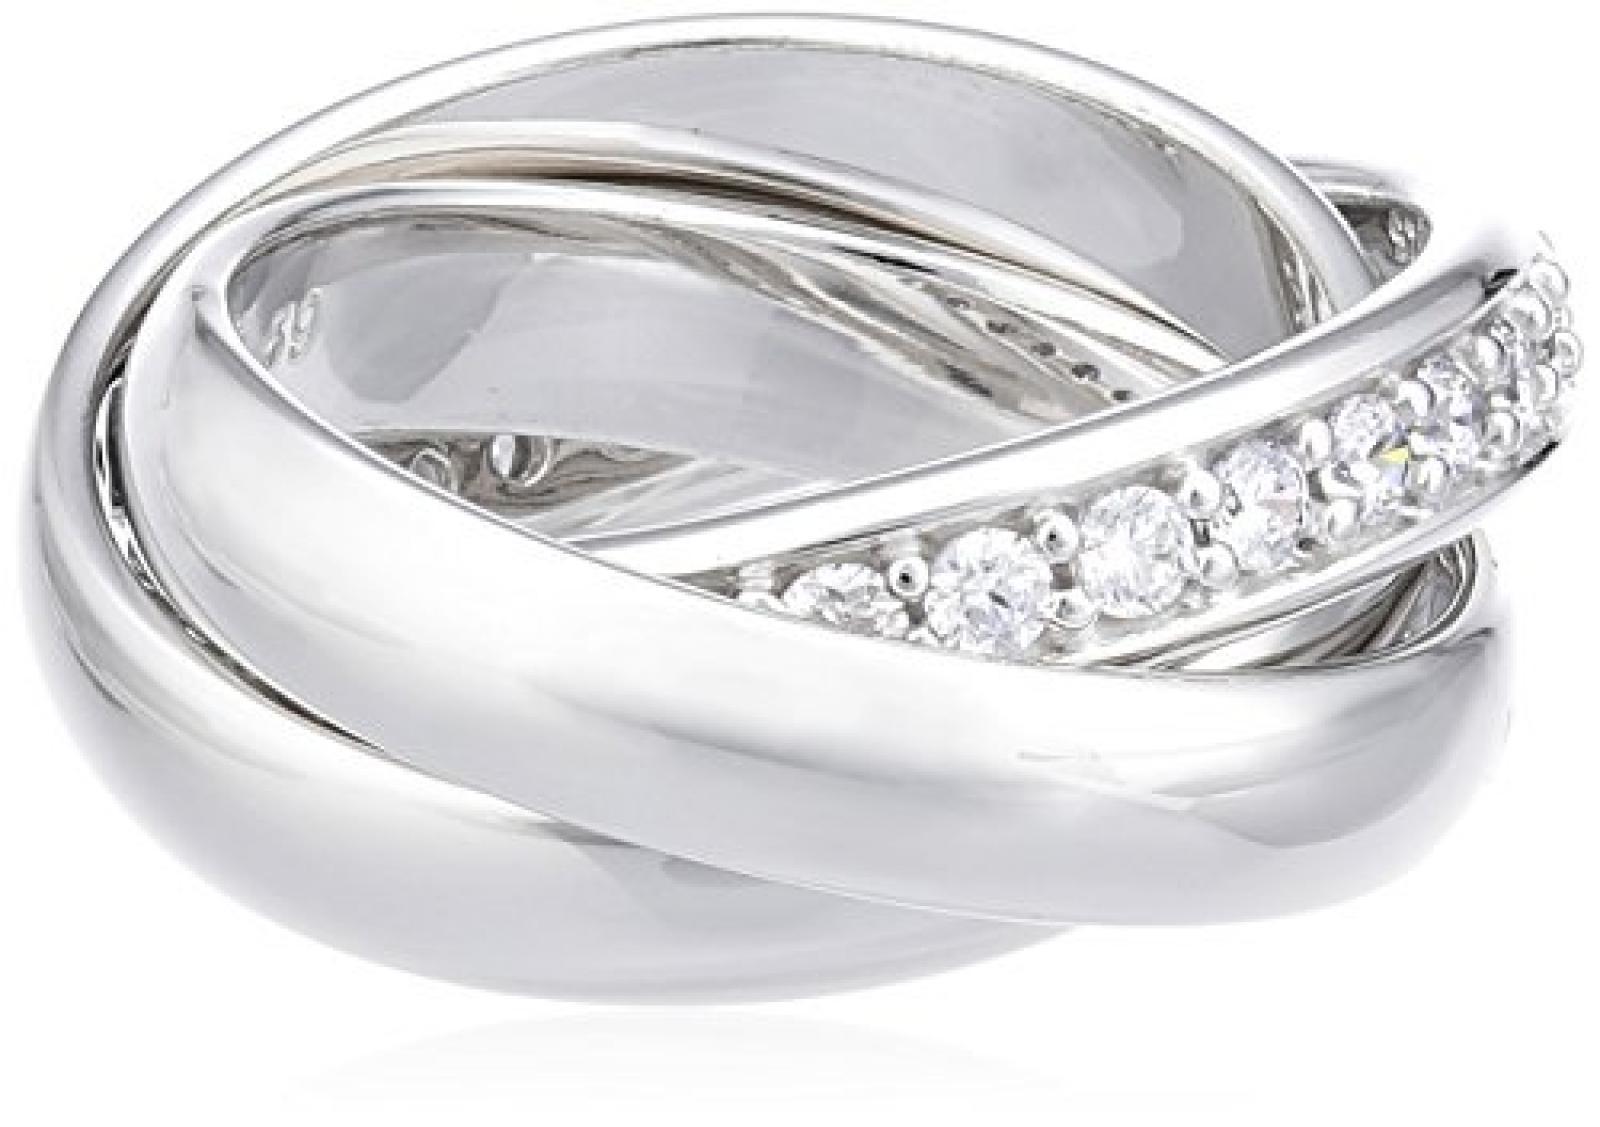 Joop! Damen-Ring Dreifacher mit Zirkonia weiÃY Gr.53 JPRG90003A530